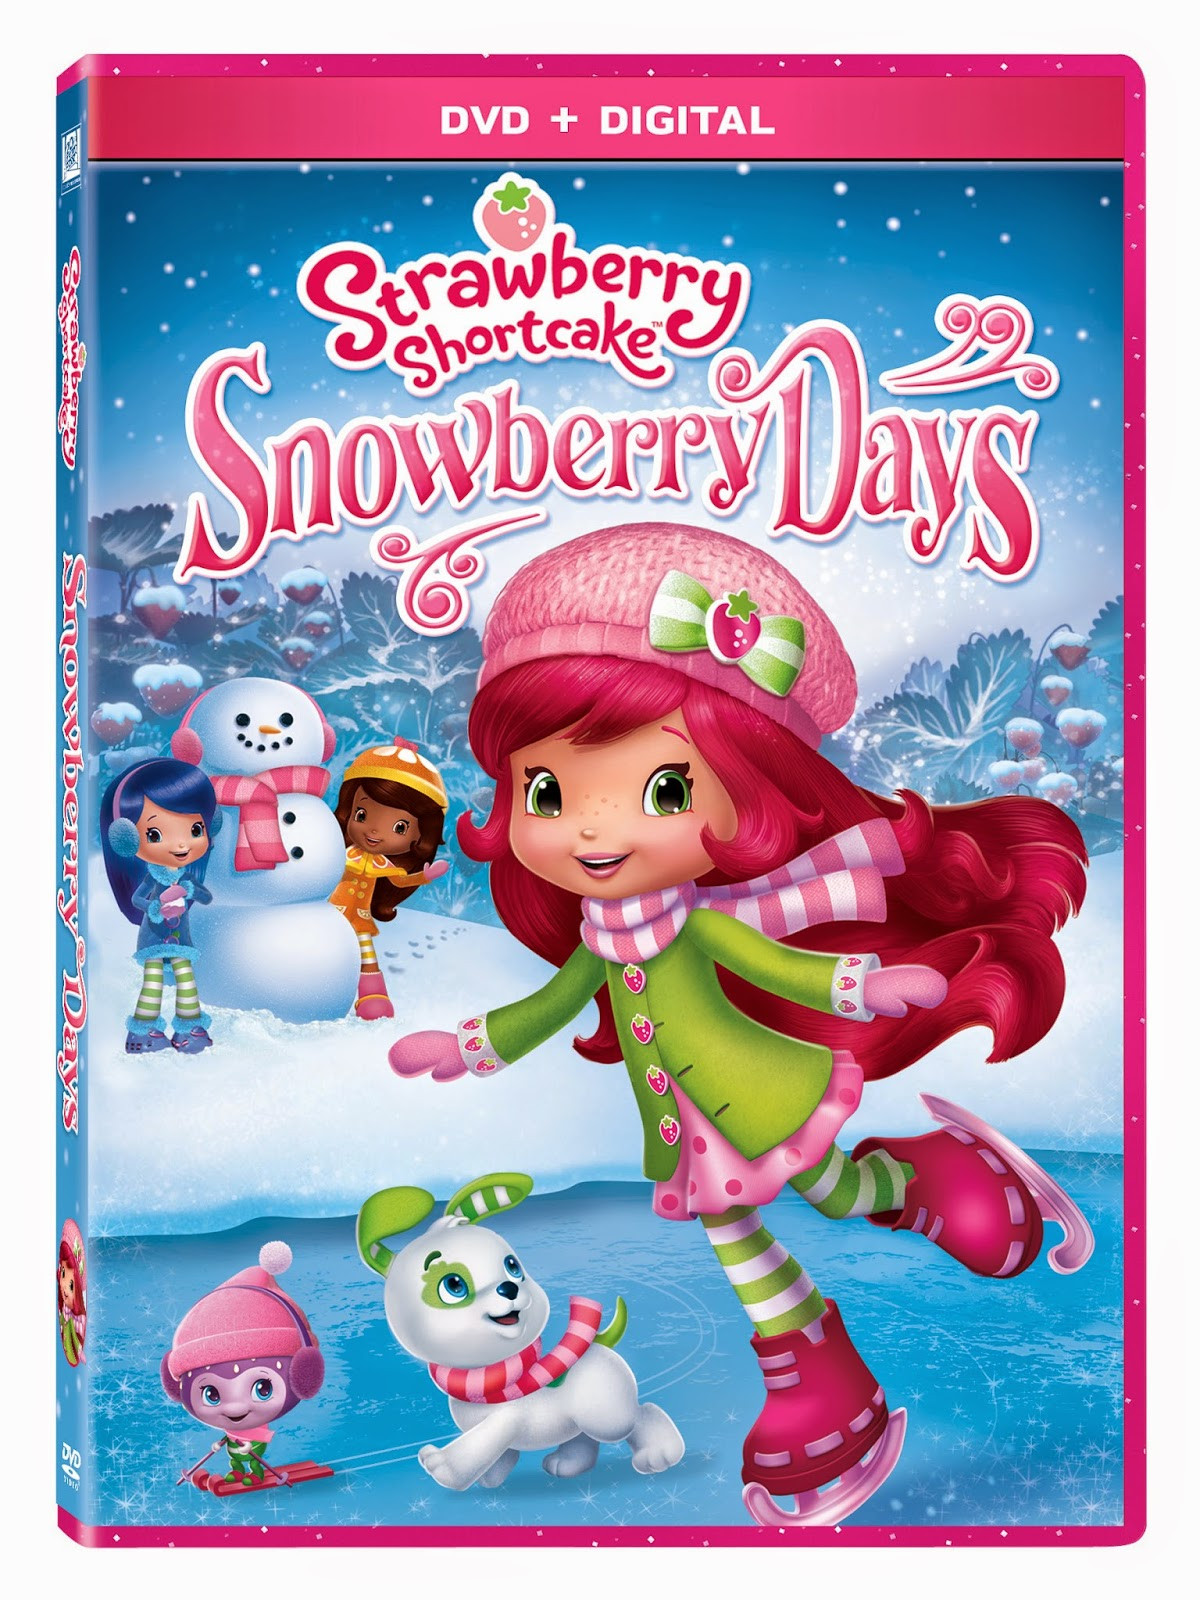 Strawberry Shortcake Dvds  MOMMY BLOG EXPERT Review Strawberry Shortcake Kids DVD